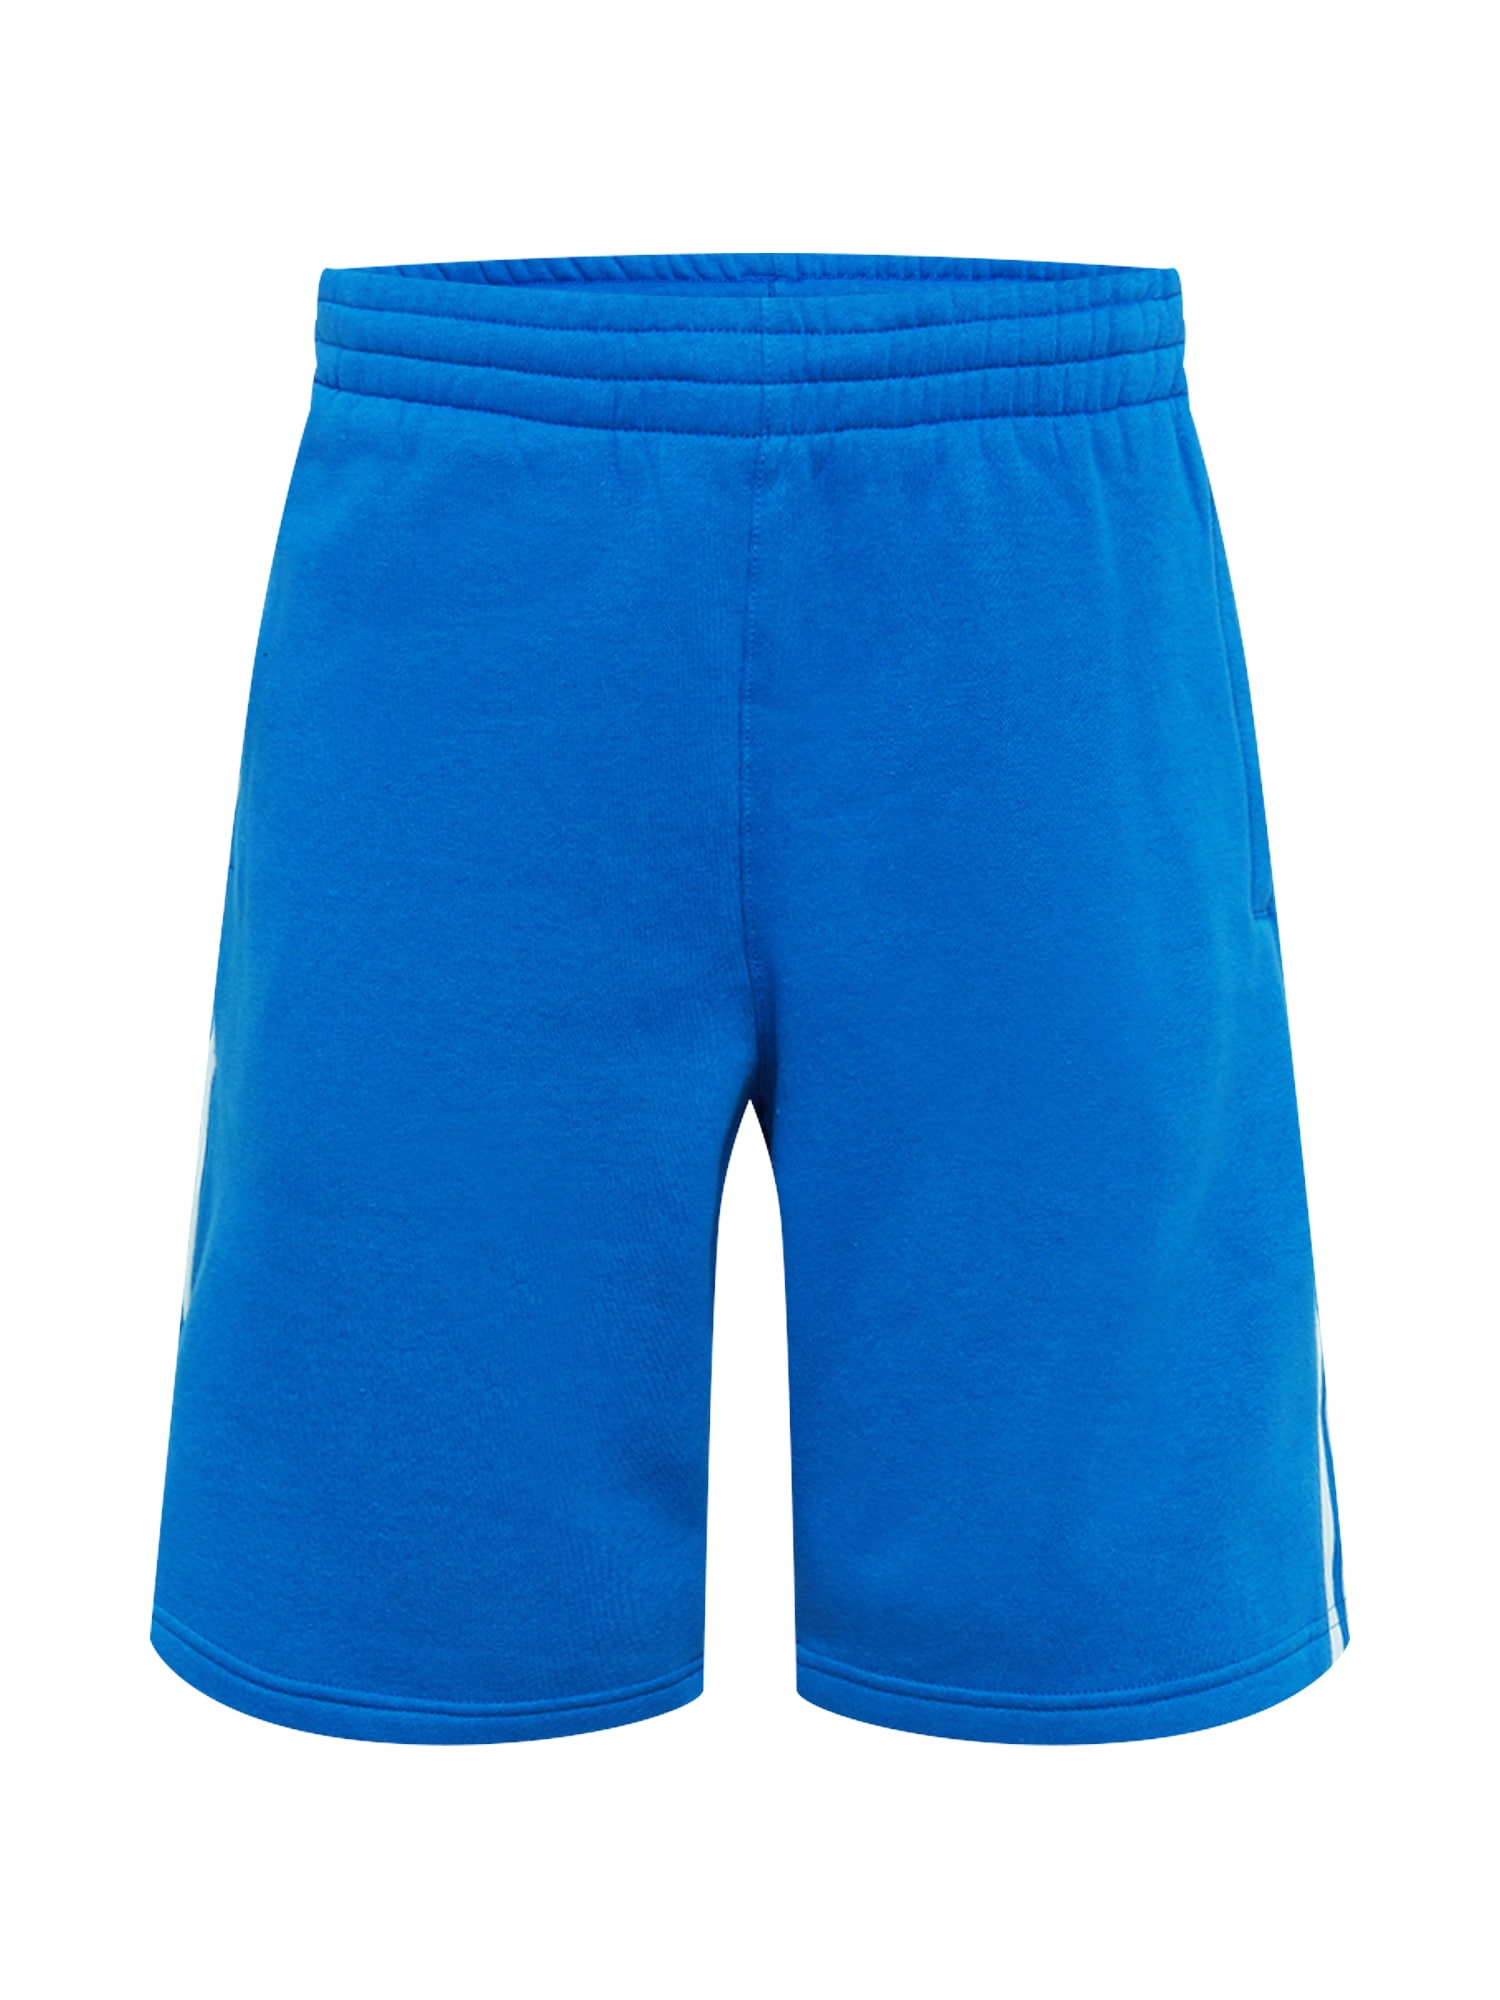 ADIDAS ORIGINALS Kelnės mėlyna / balta